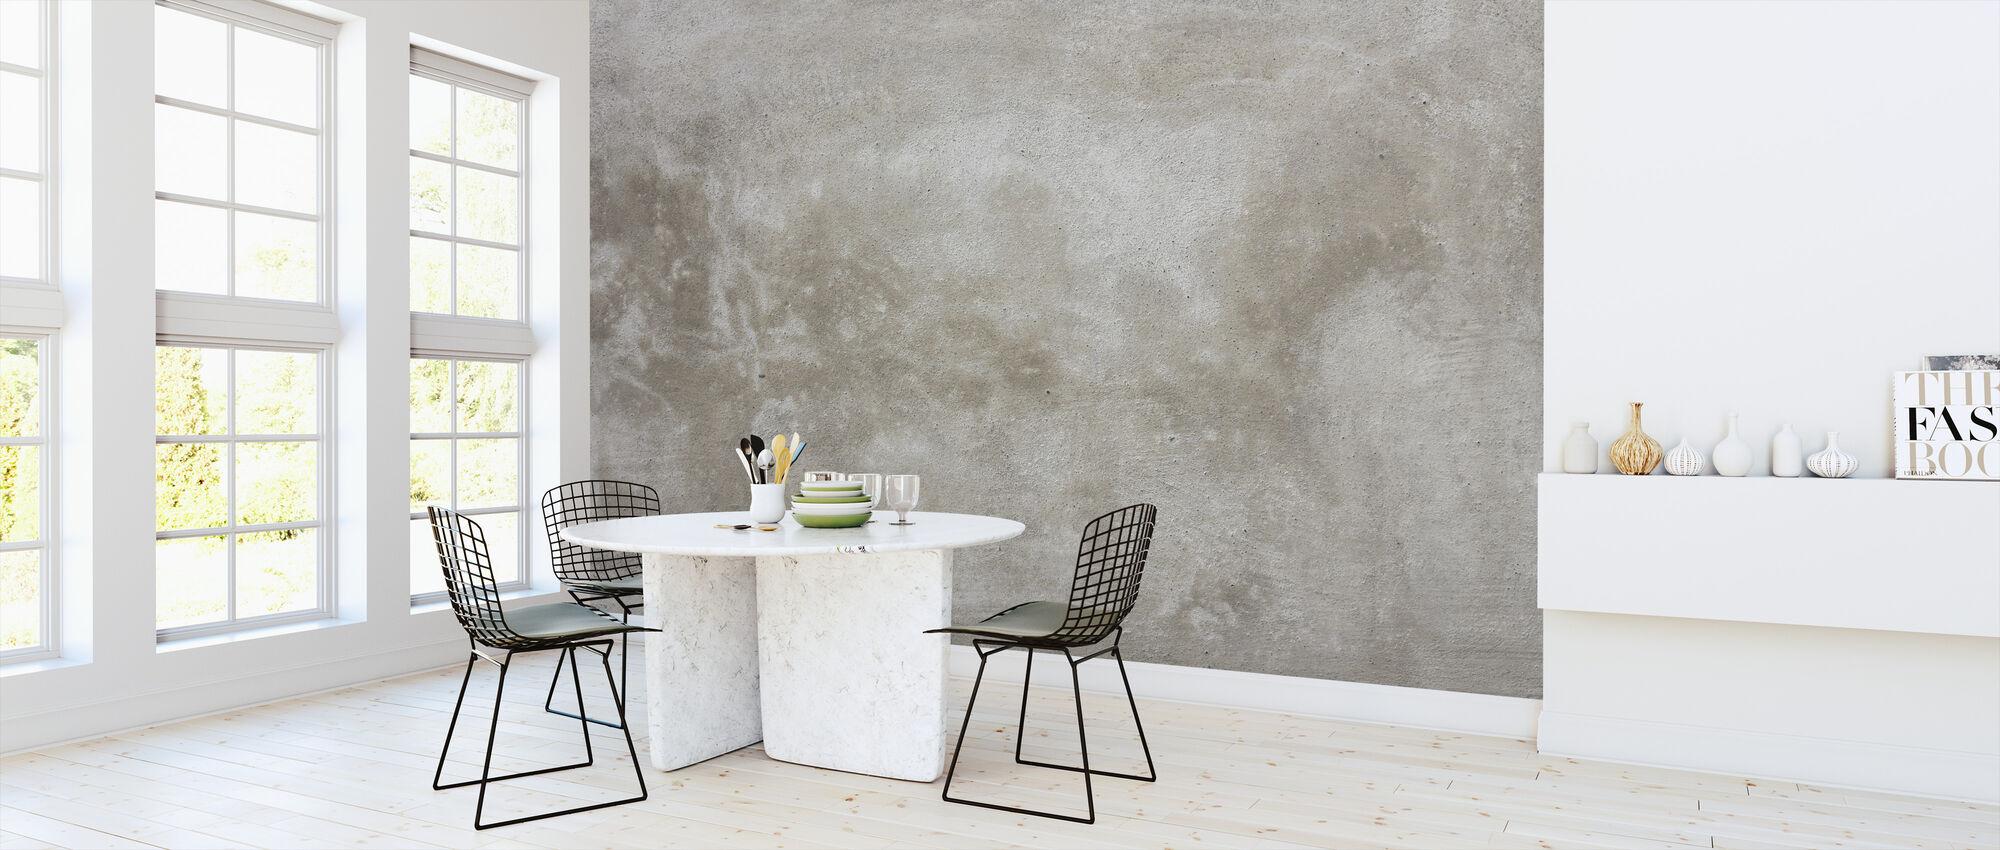 Torn Beige Stone Wall - Wallpaper - Kitchen